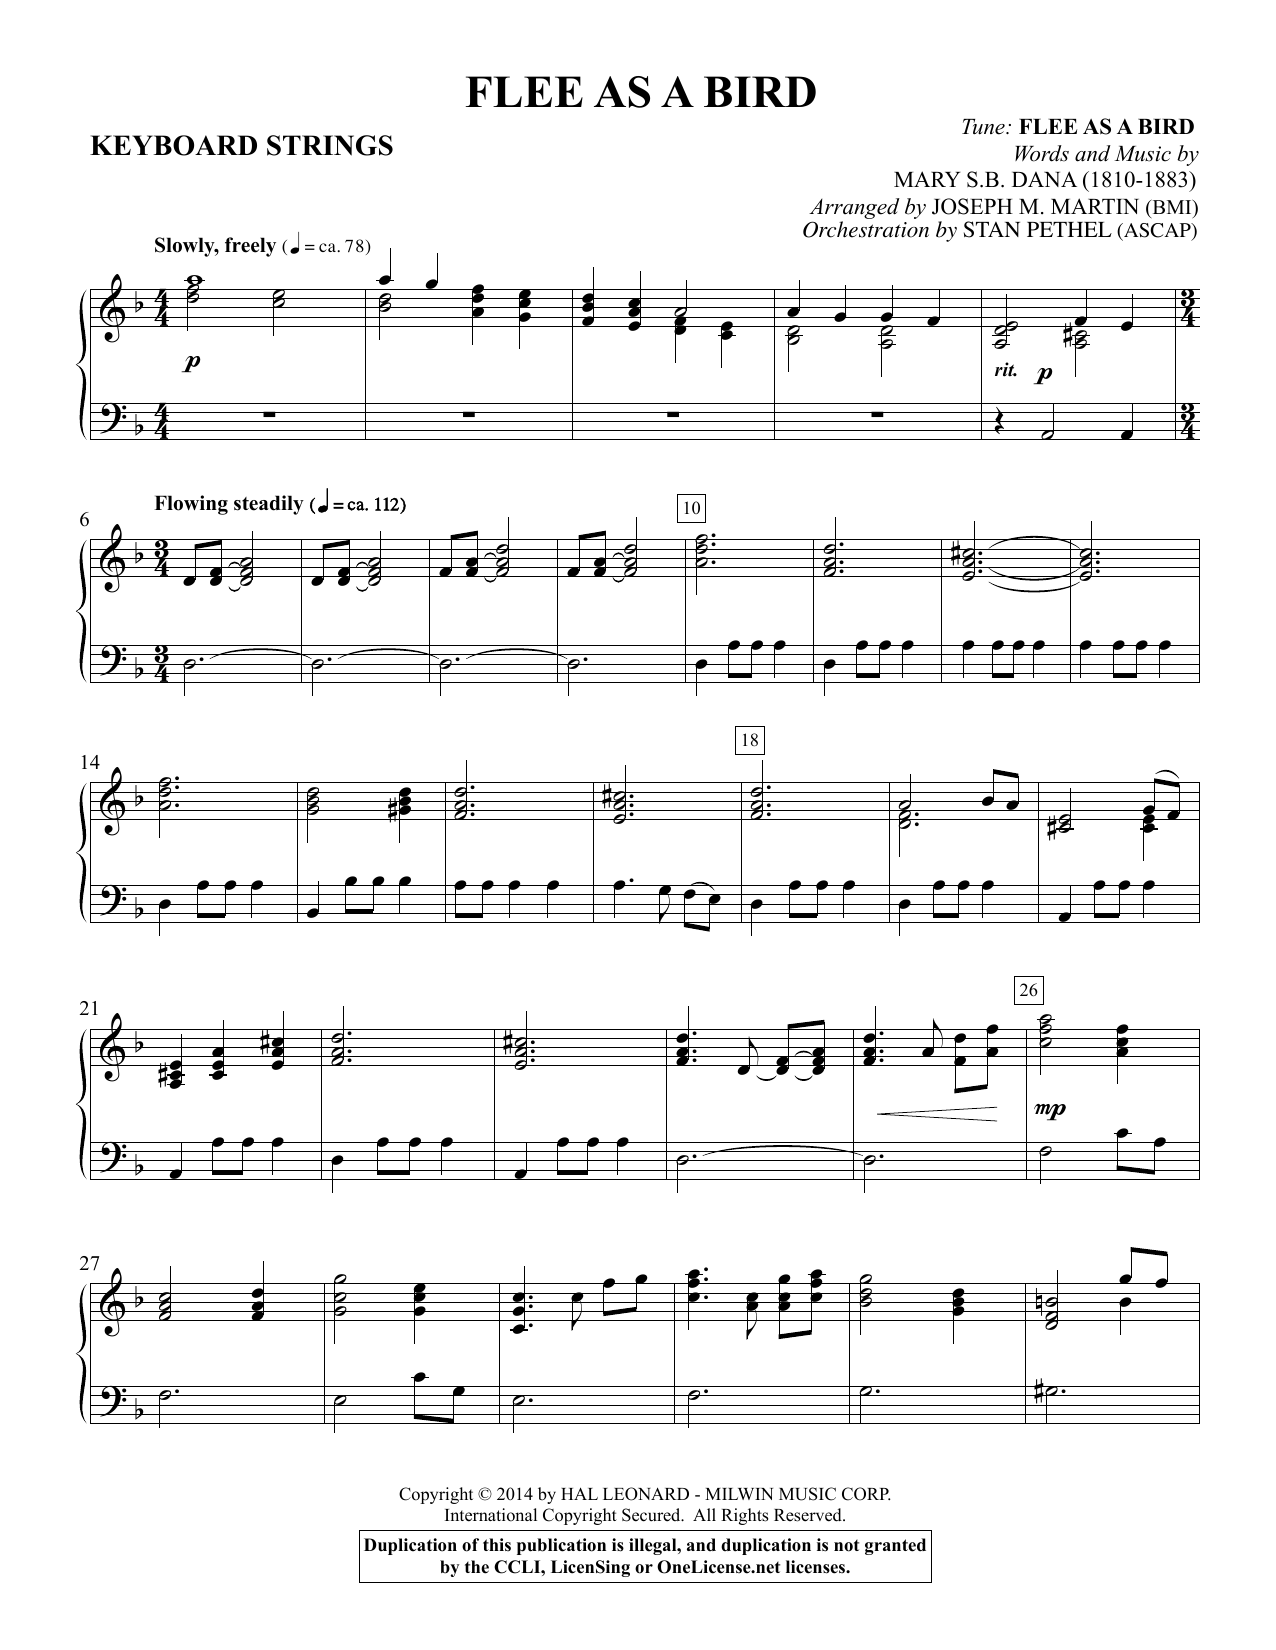 Flee As a Bird - Keyboard String Reduction Sheet Music